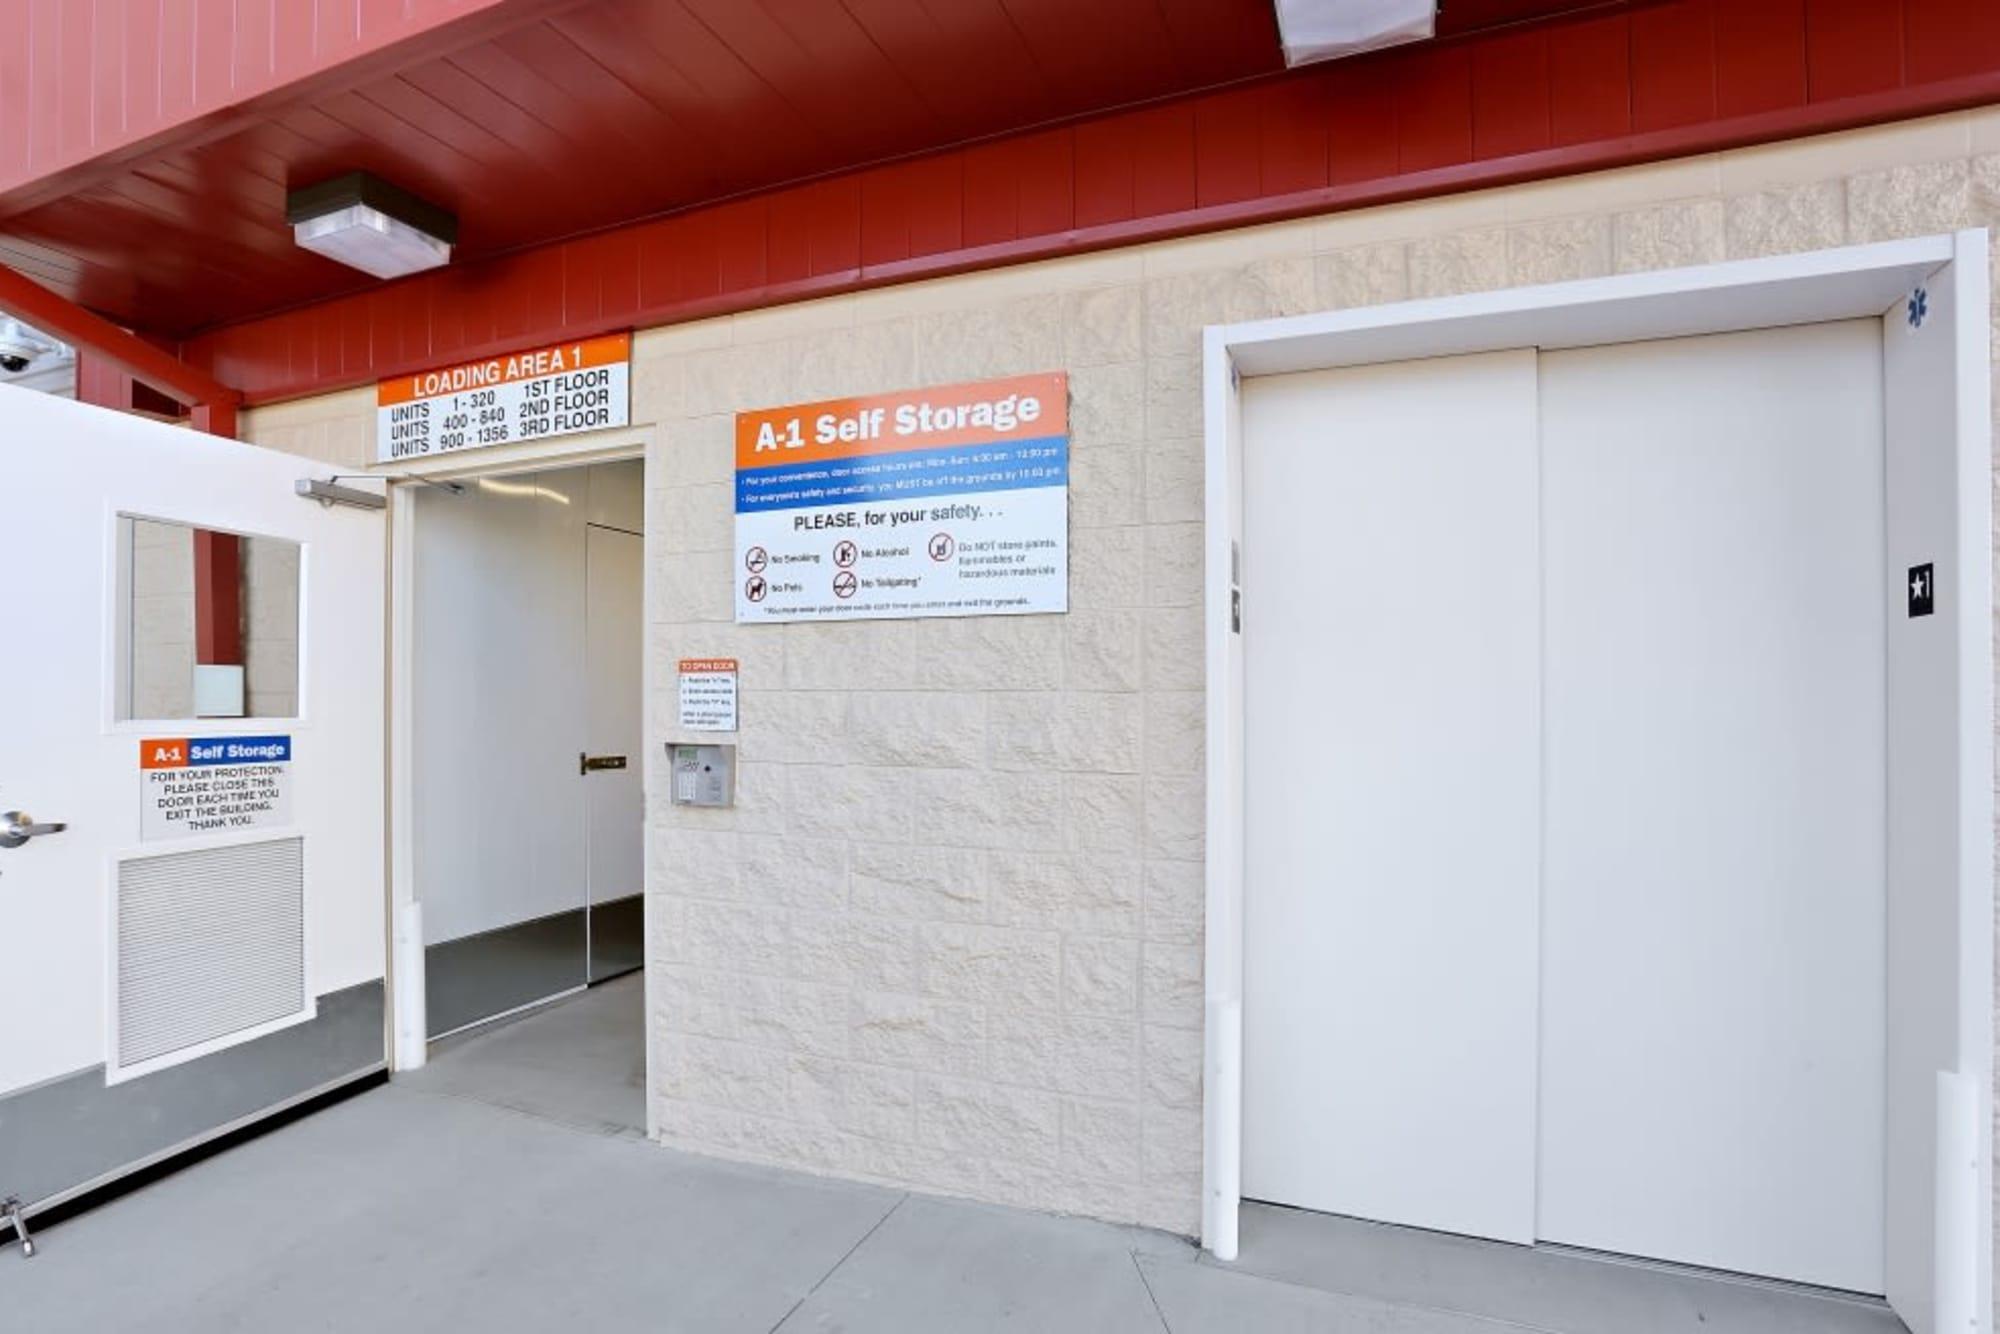 Wide elevator at A-1 Self Storage in San Diego, California